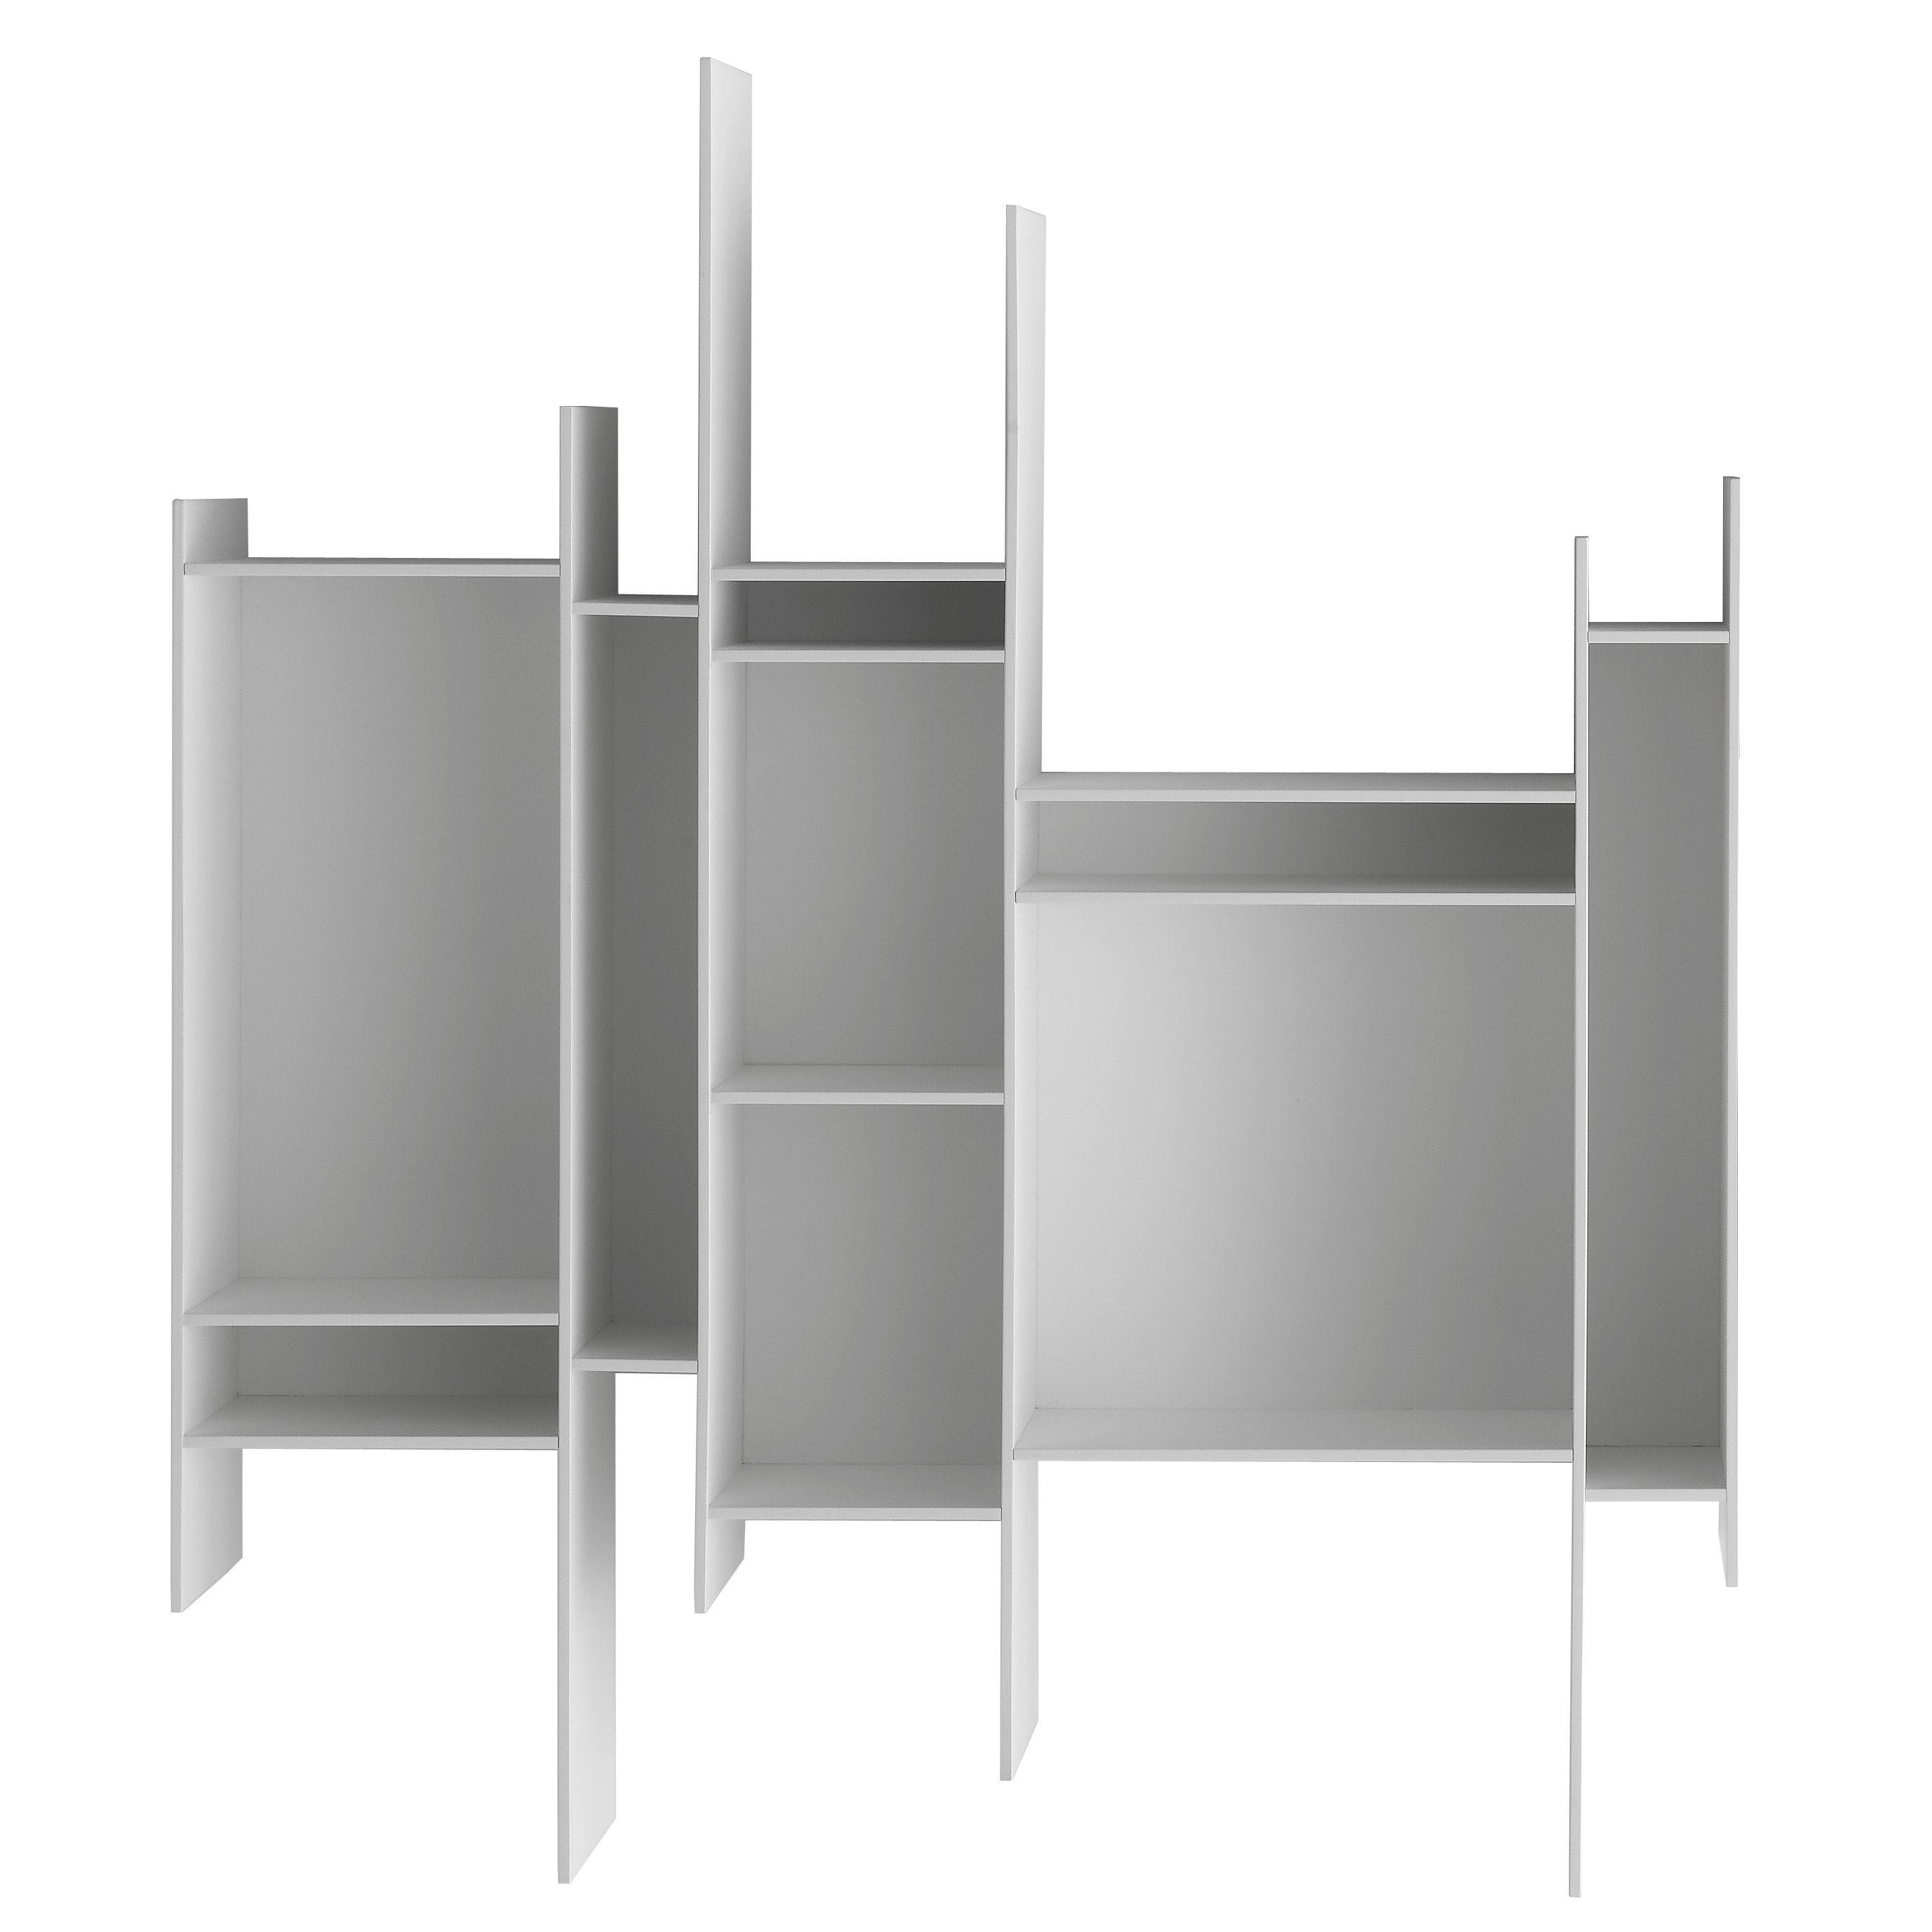 etag re randomito l 81 x h 96 cm laqu blanc mdf italia. Black Bedroom Furniture Sets. Home Design Ideas